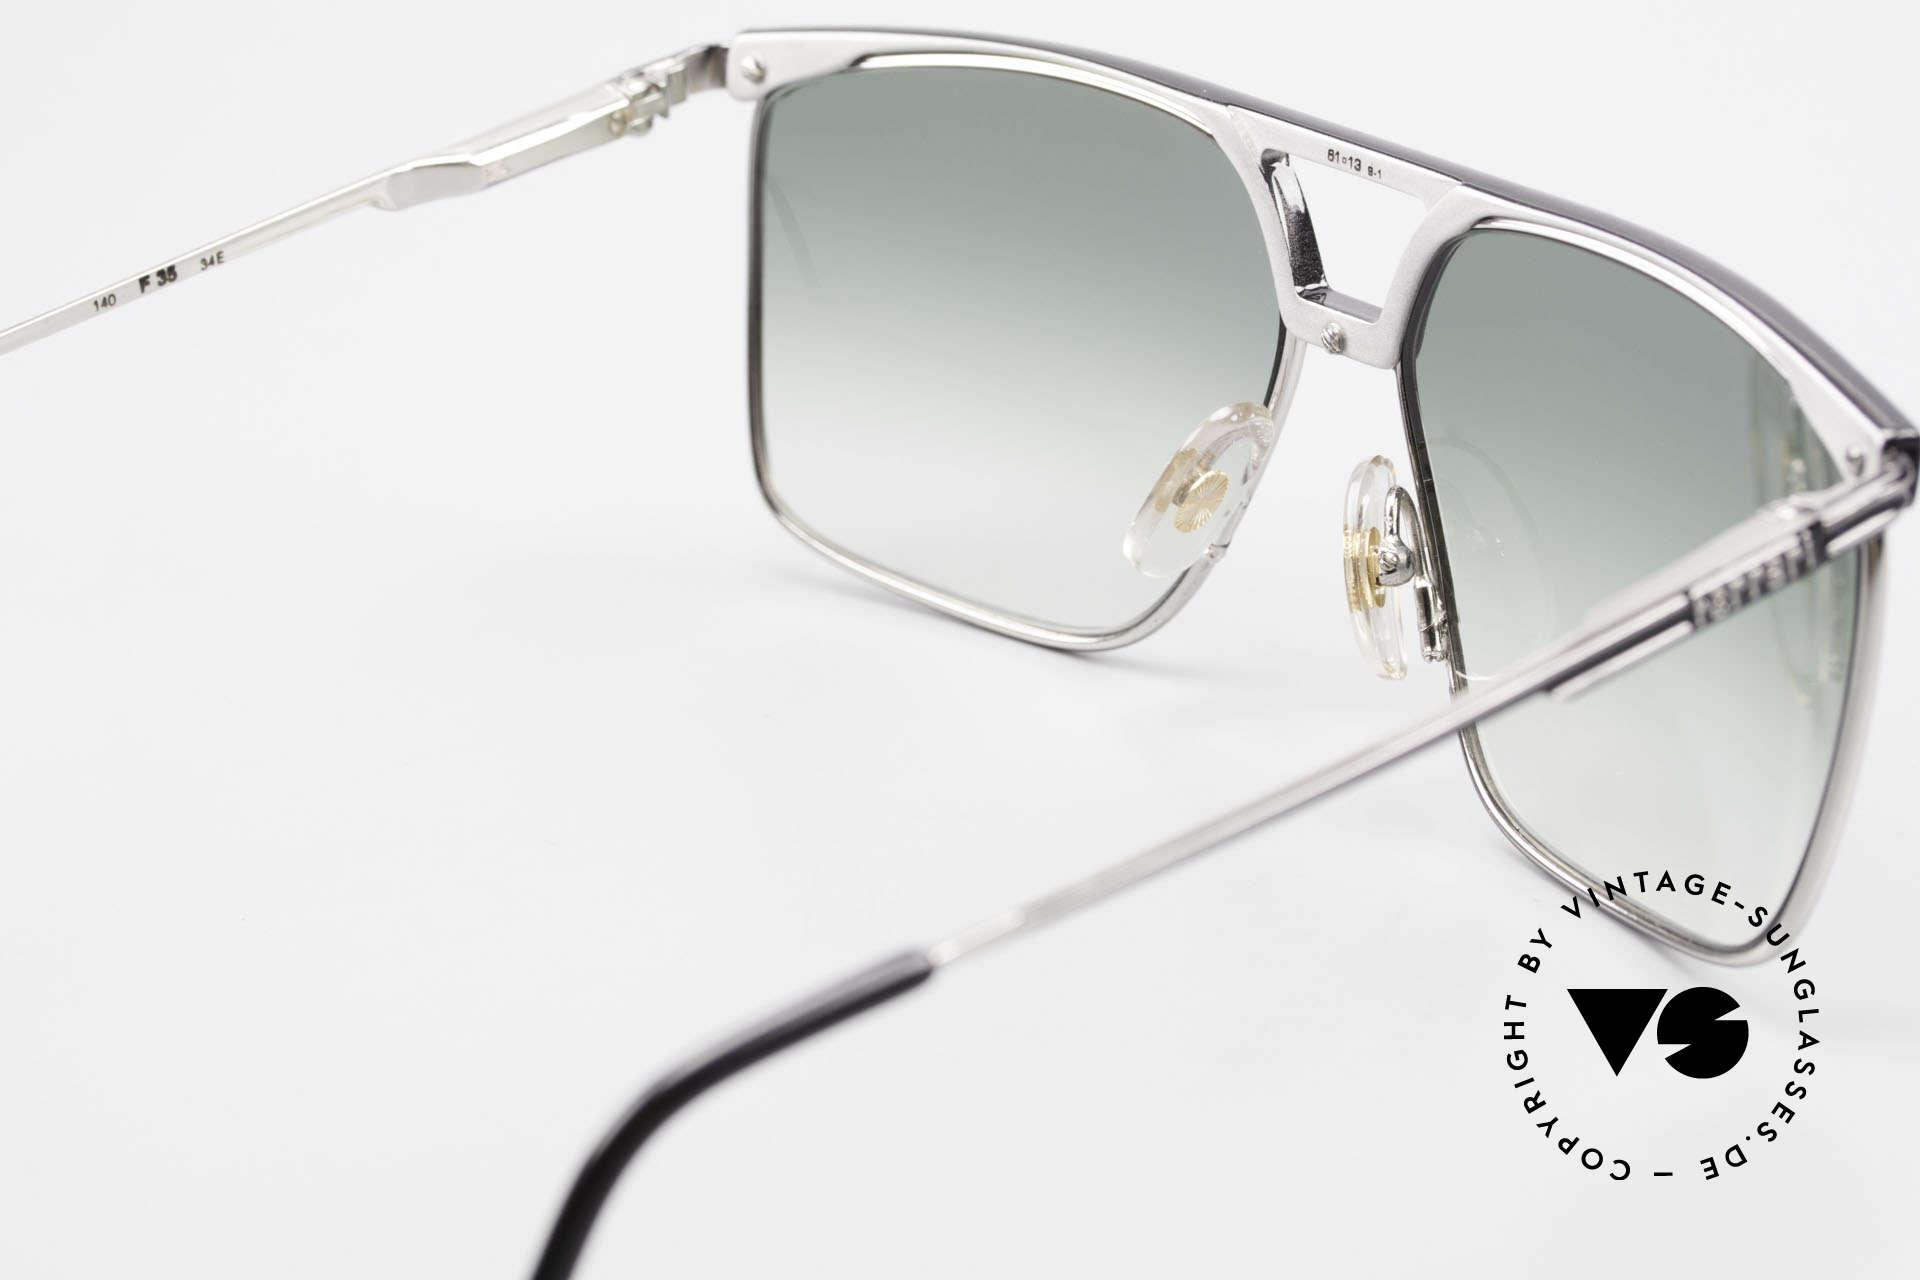 Ferrari F35 Alutanium Sunglasses Large, top-notch quality; large size 61-13, 140, F35, col 34E, Made for Men